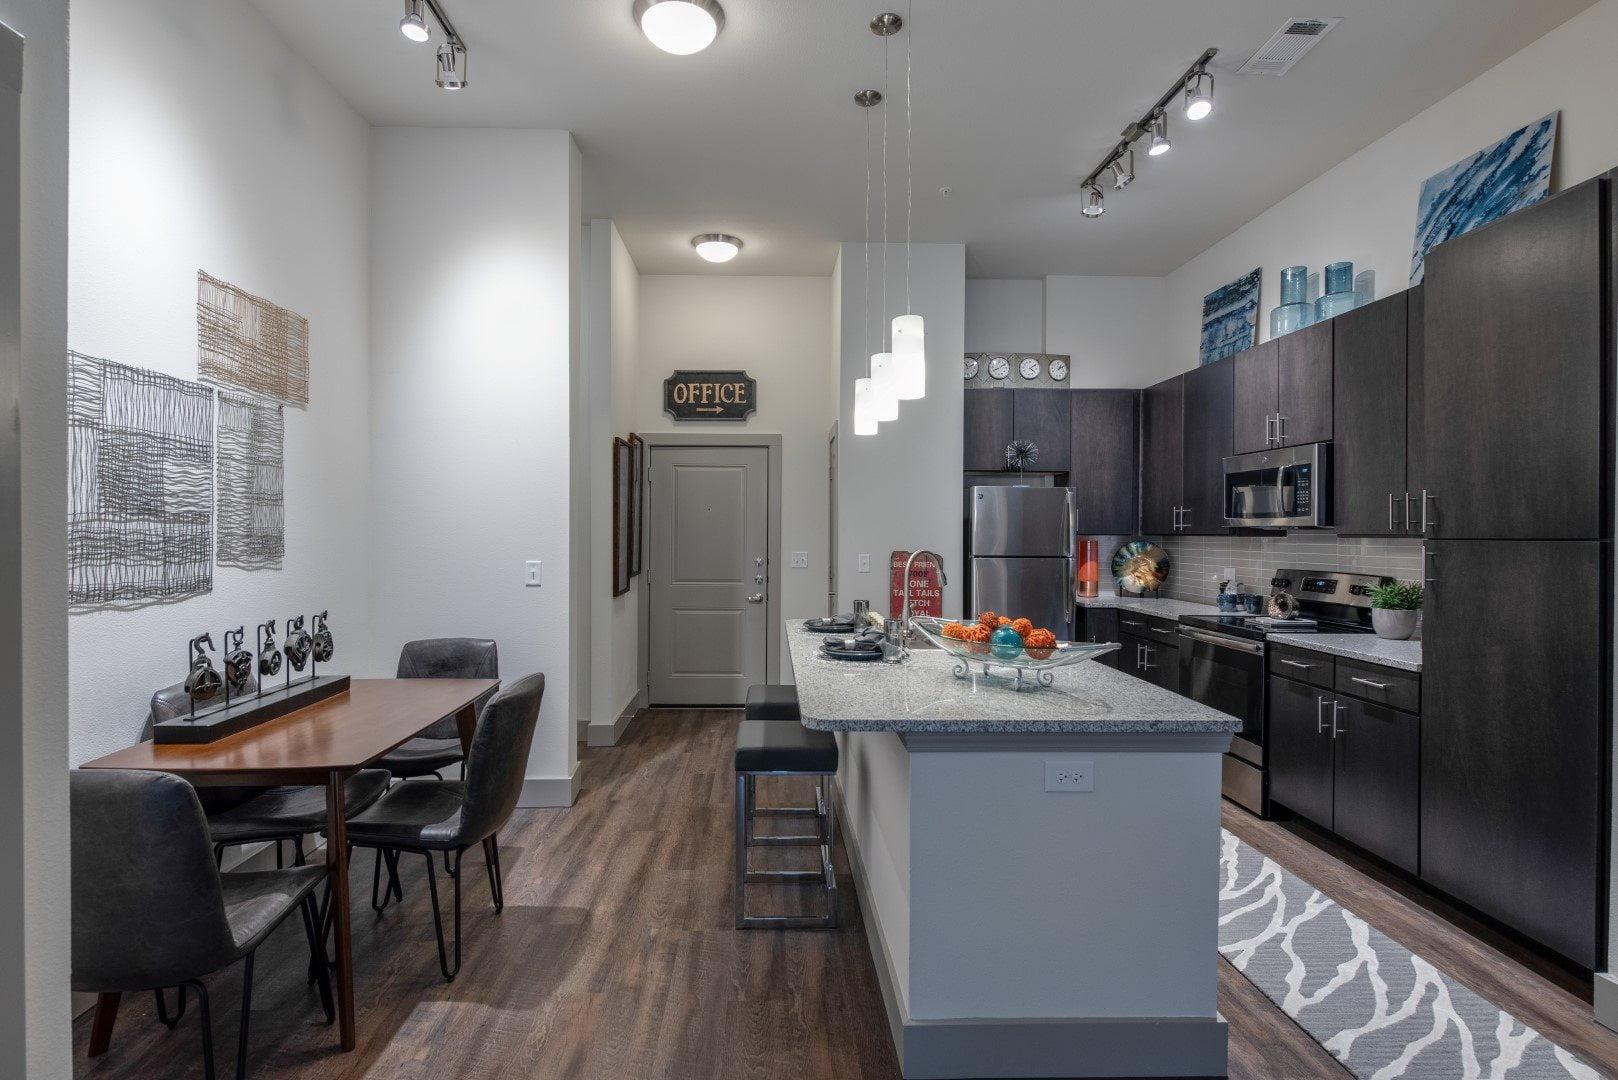 new apartments near ft. worth